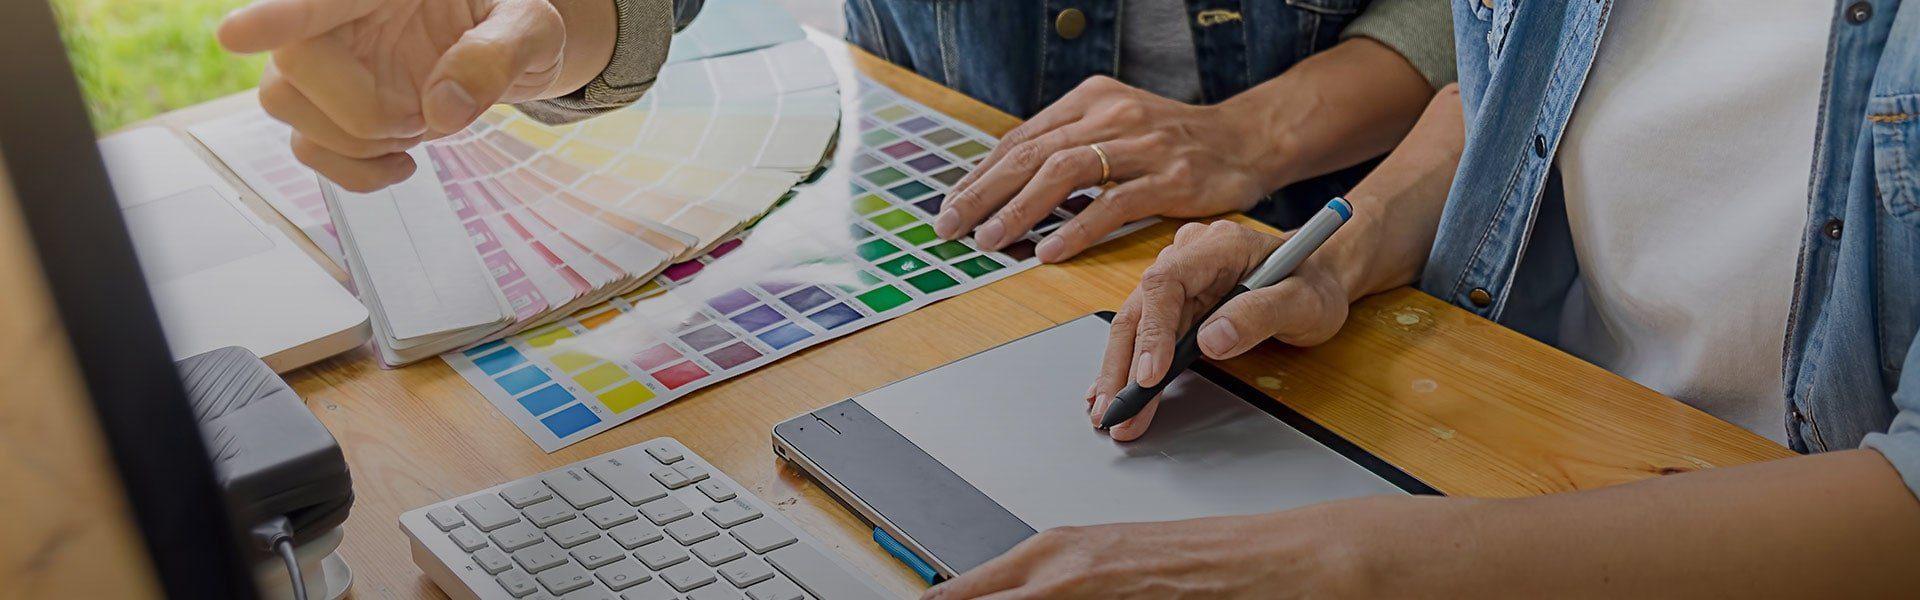 Graphic Design Kzoo